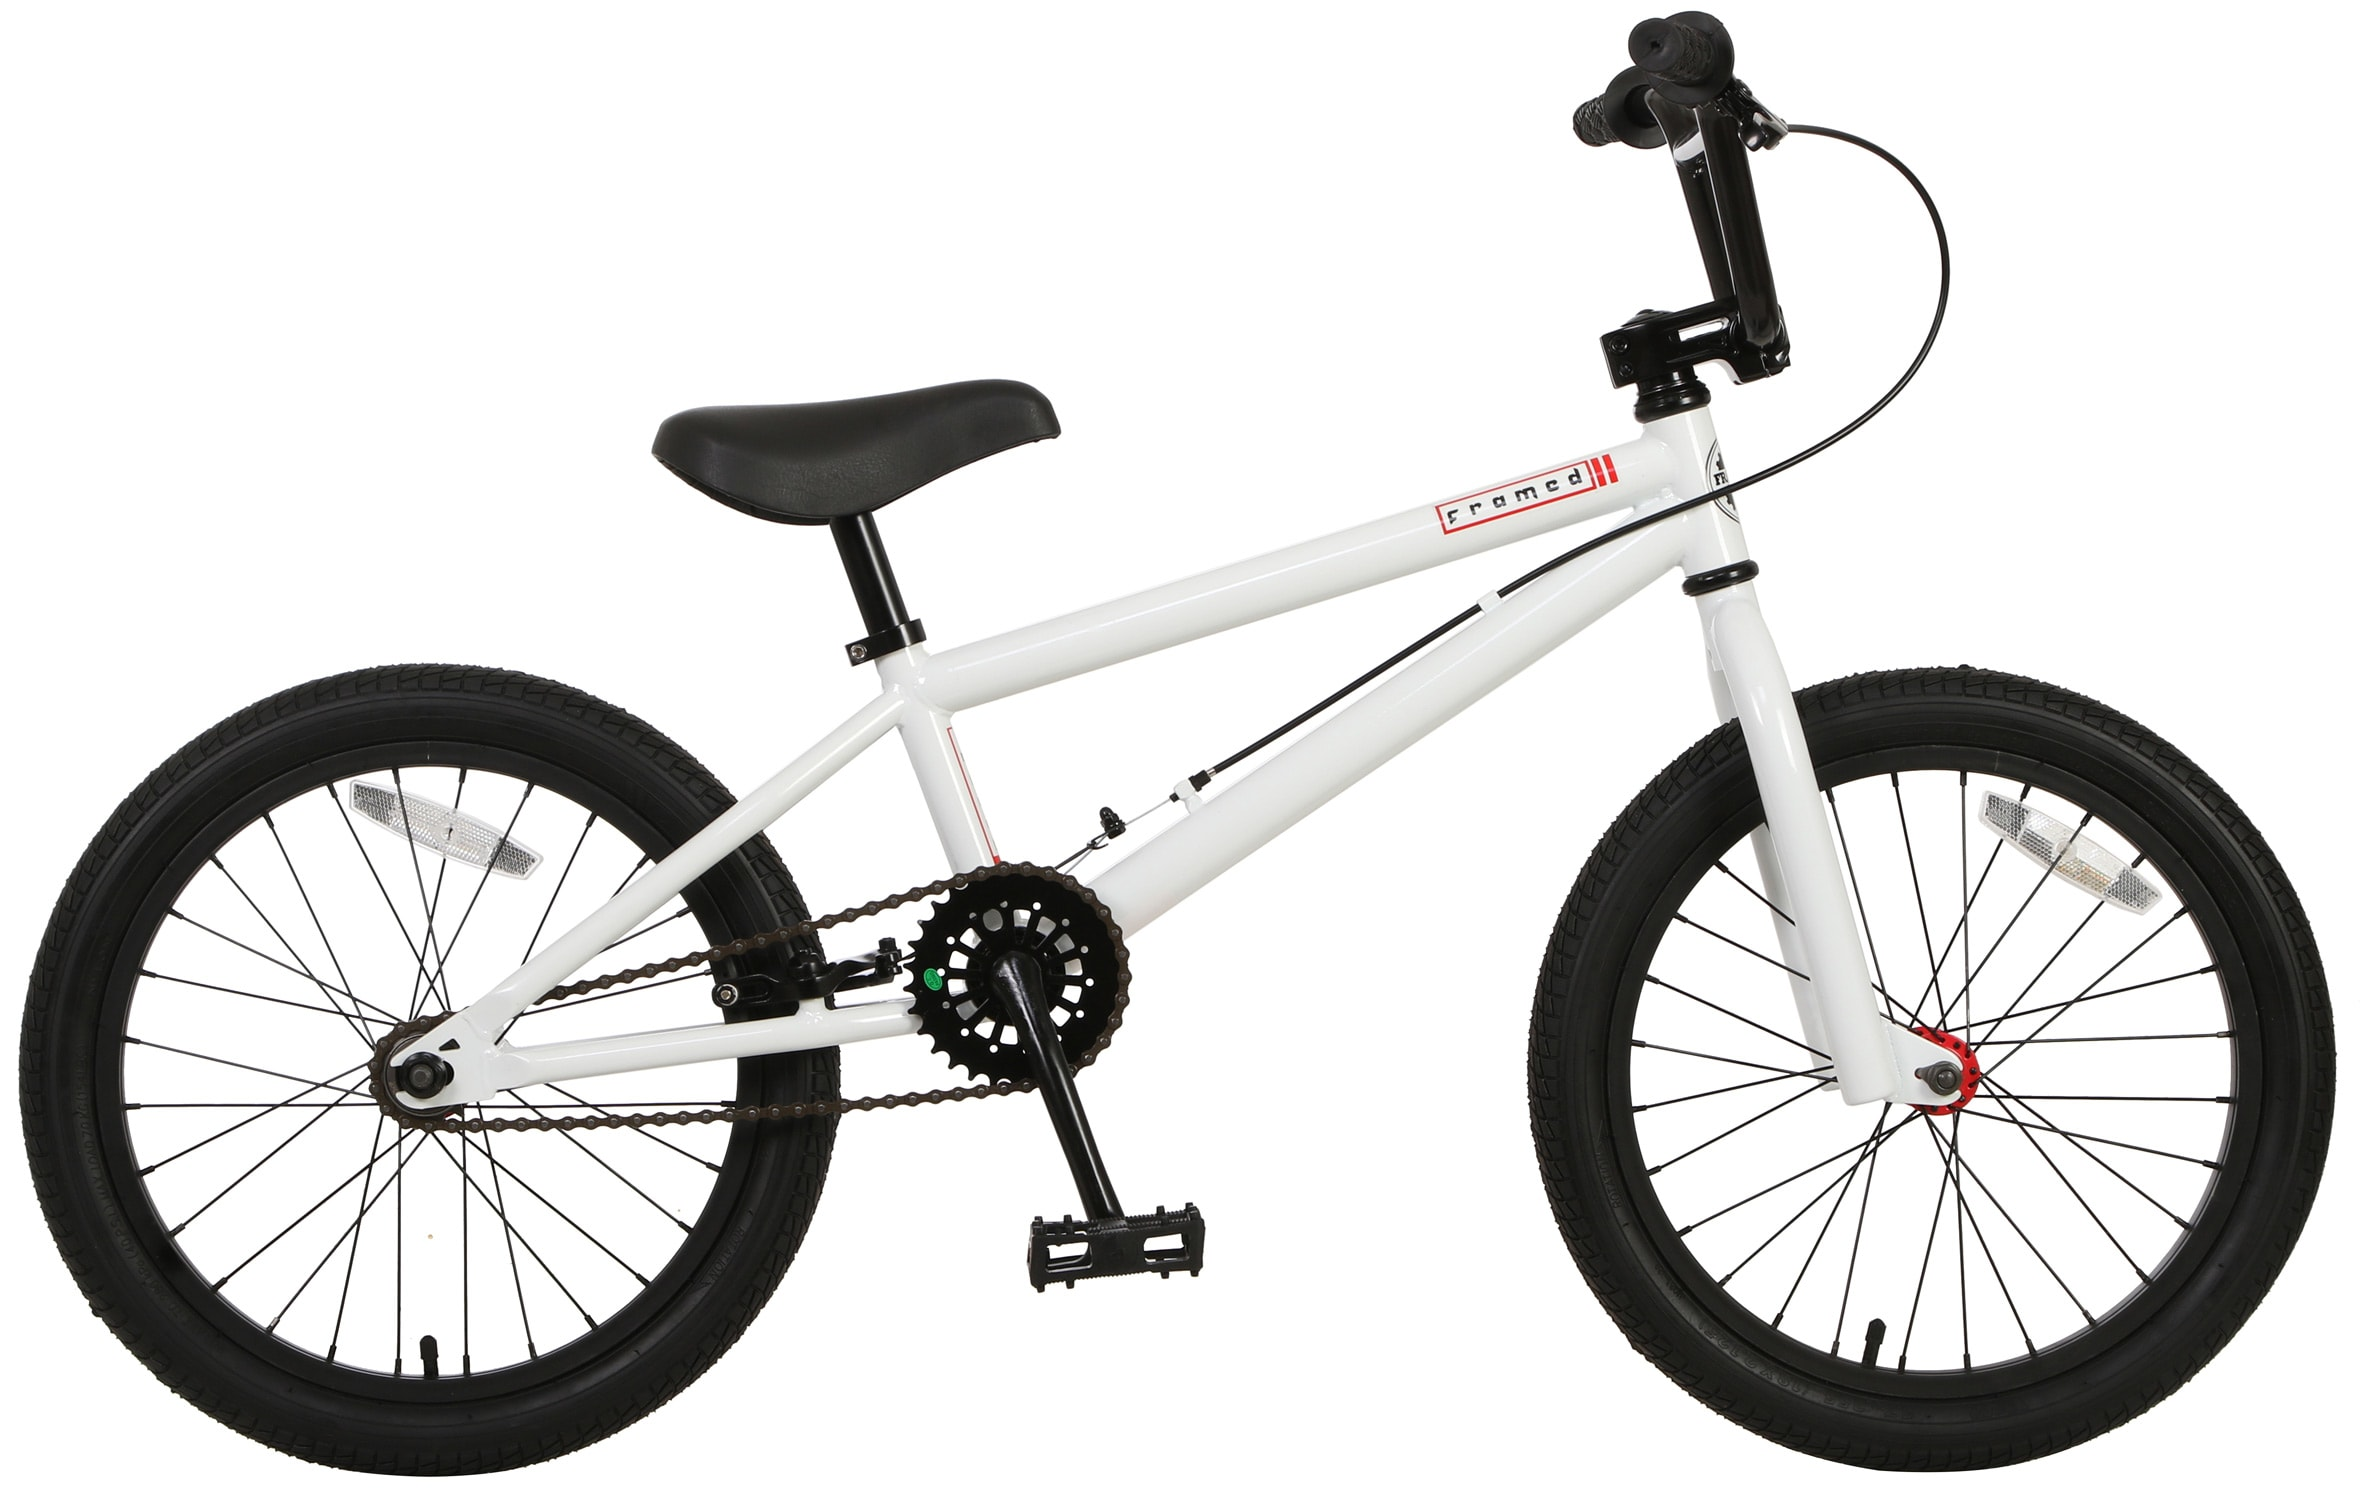 Framed Impact 18 BMX Bike - Kids, Youth